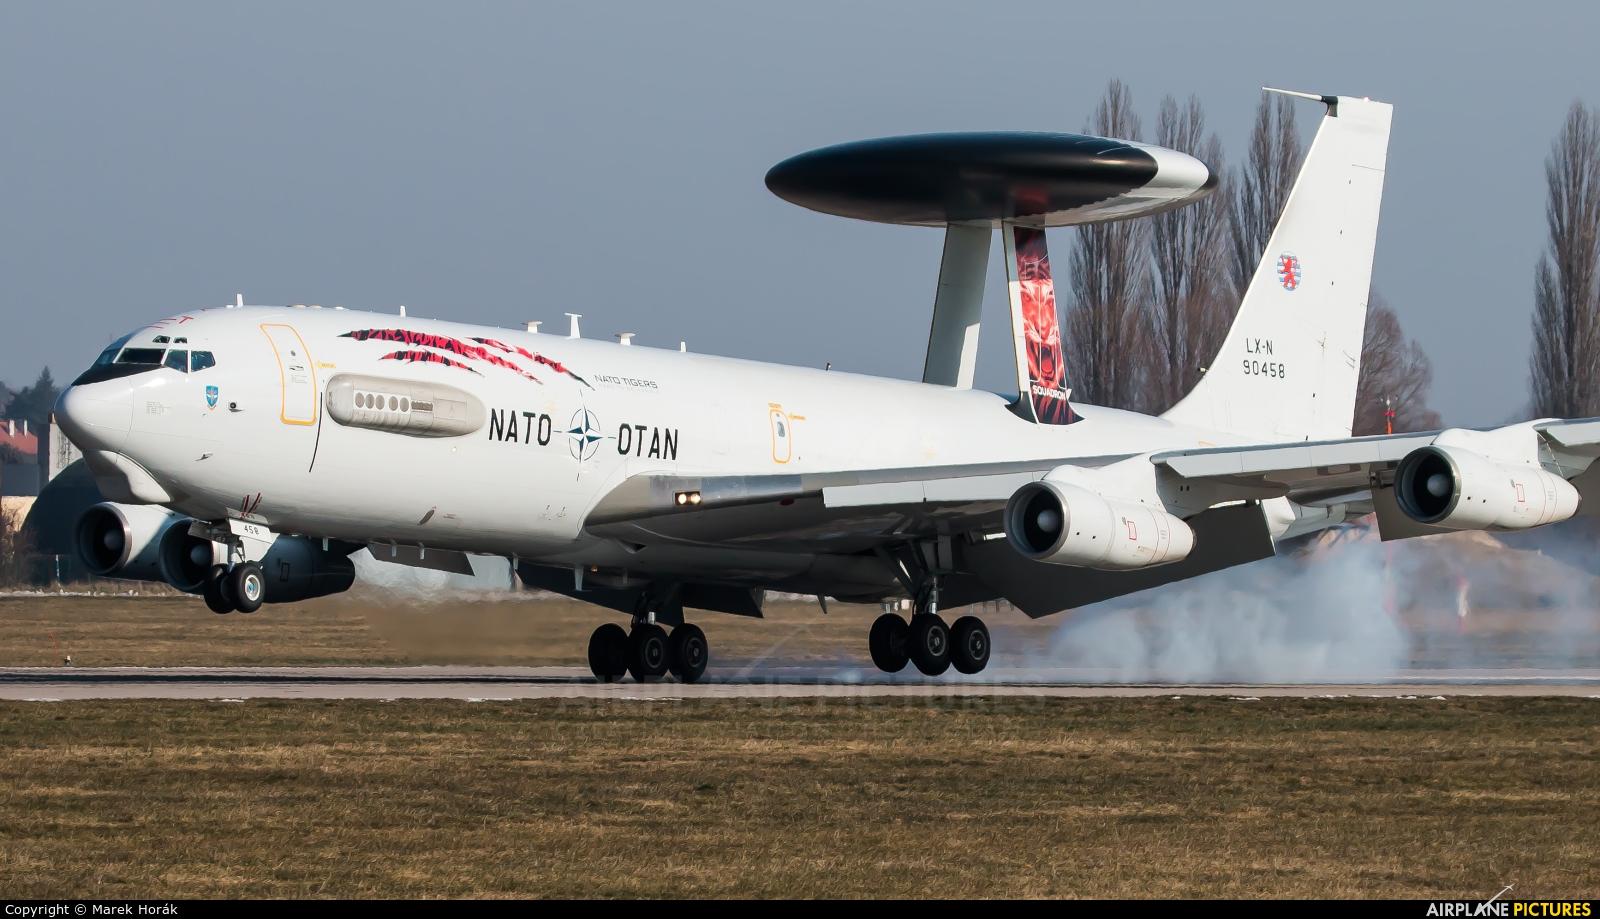 NATO LX-N90458 aircraft at Pardubice